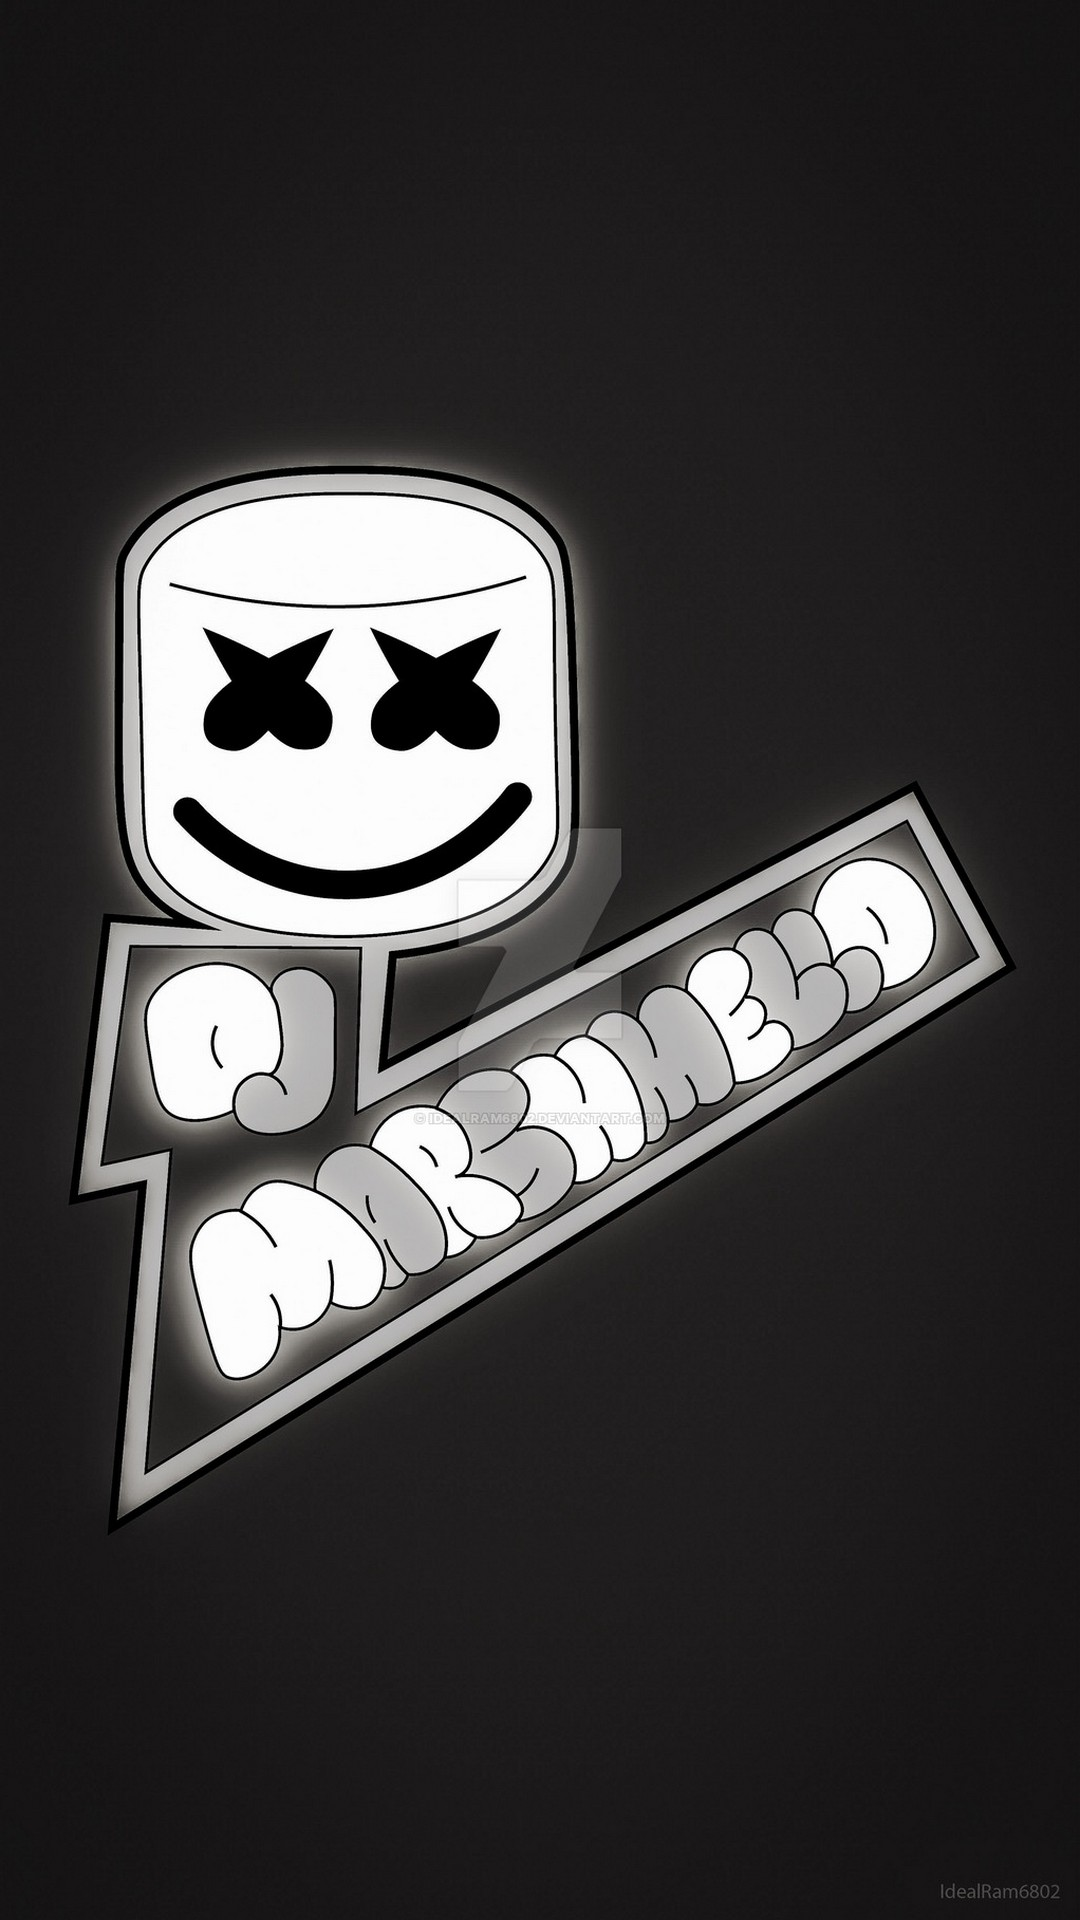 Wallpaper Android Marshmello